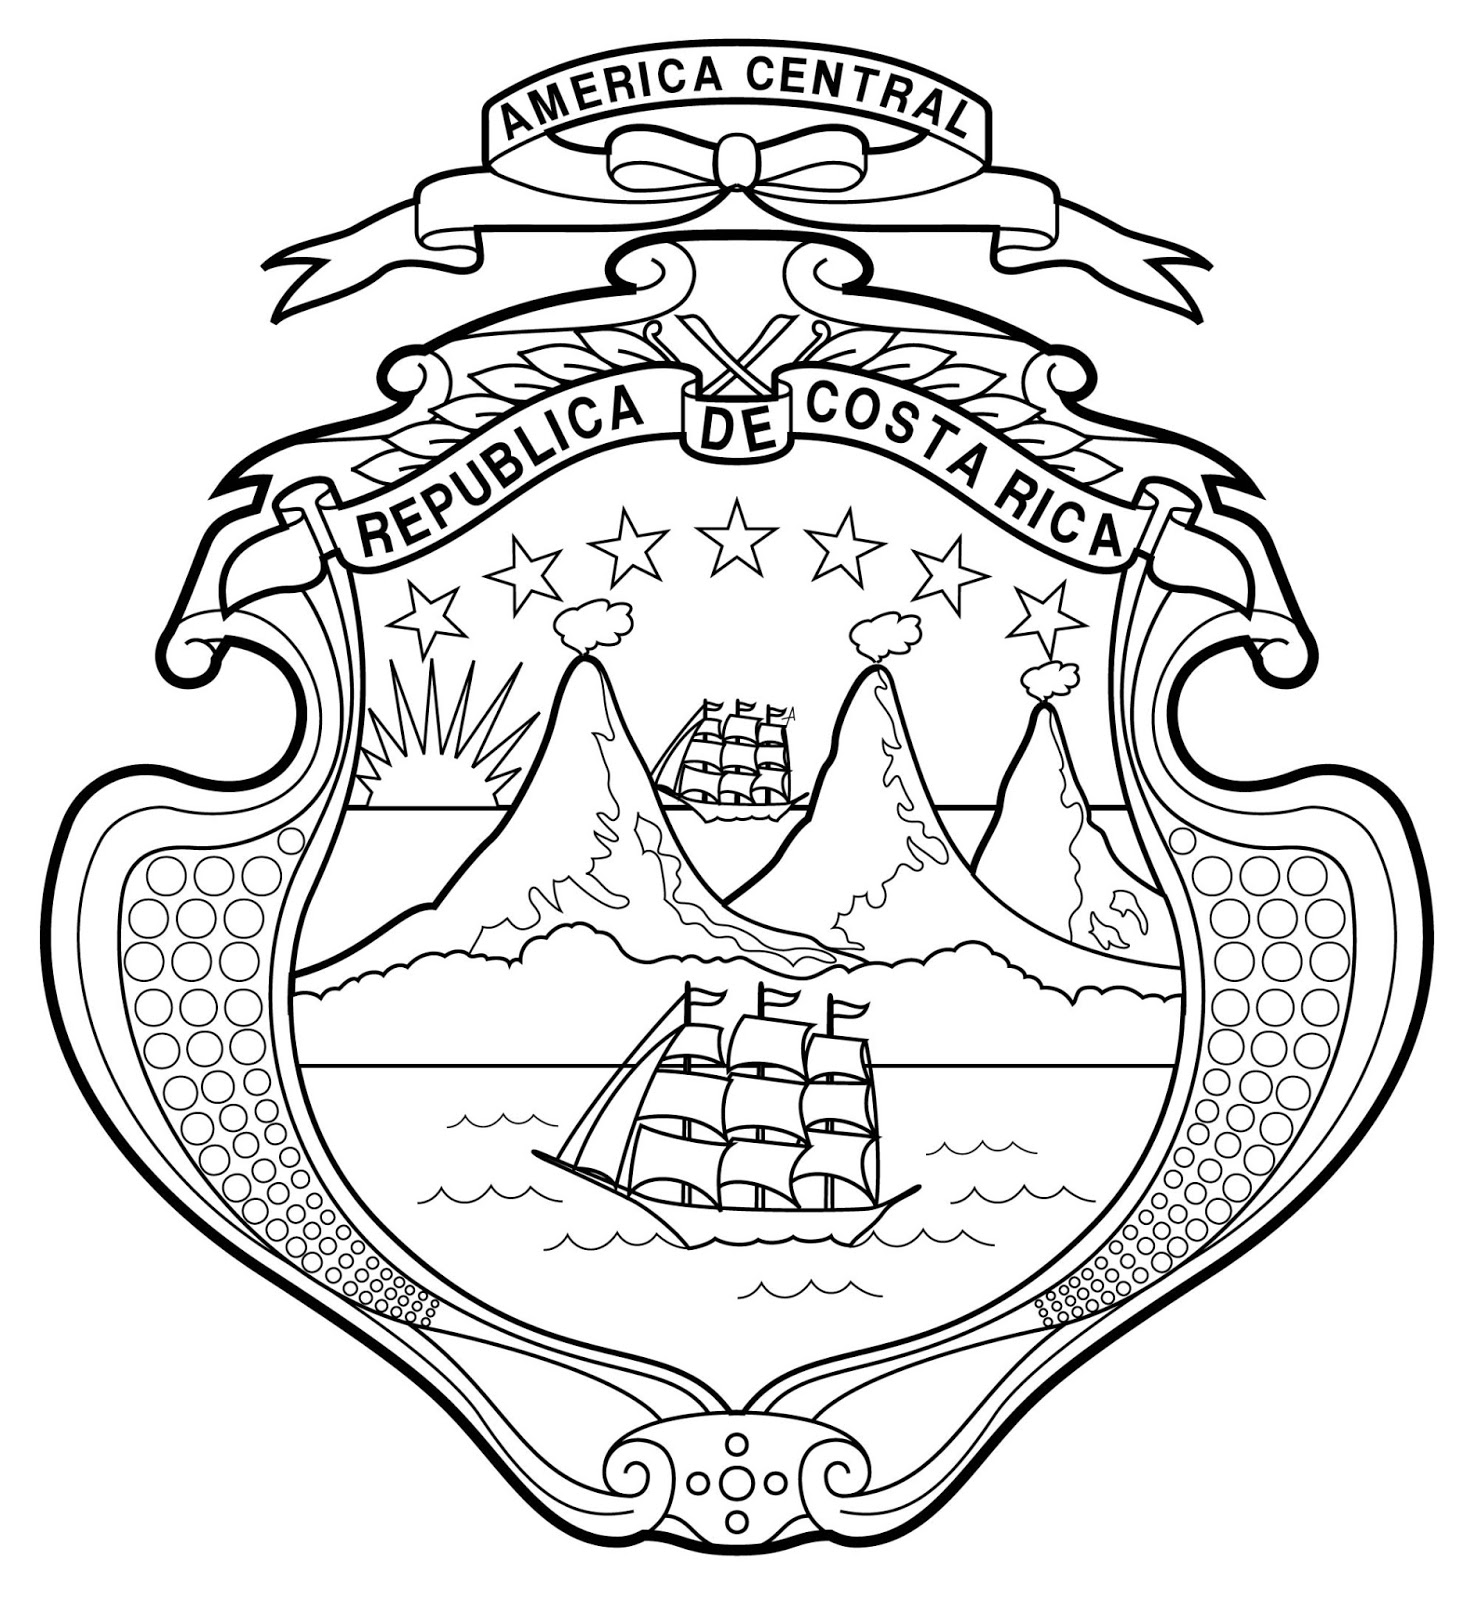 Escudo de Costa Rica | Ideama • Surá diseño